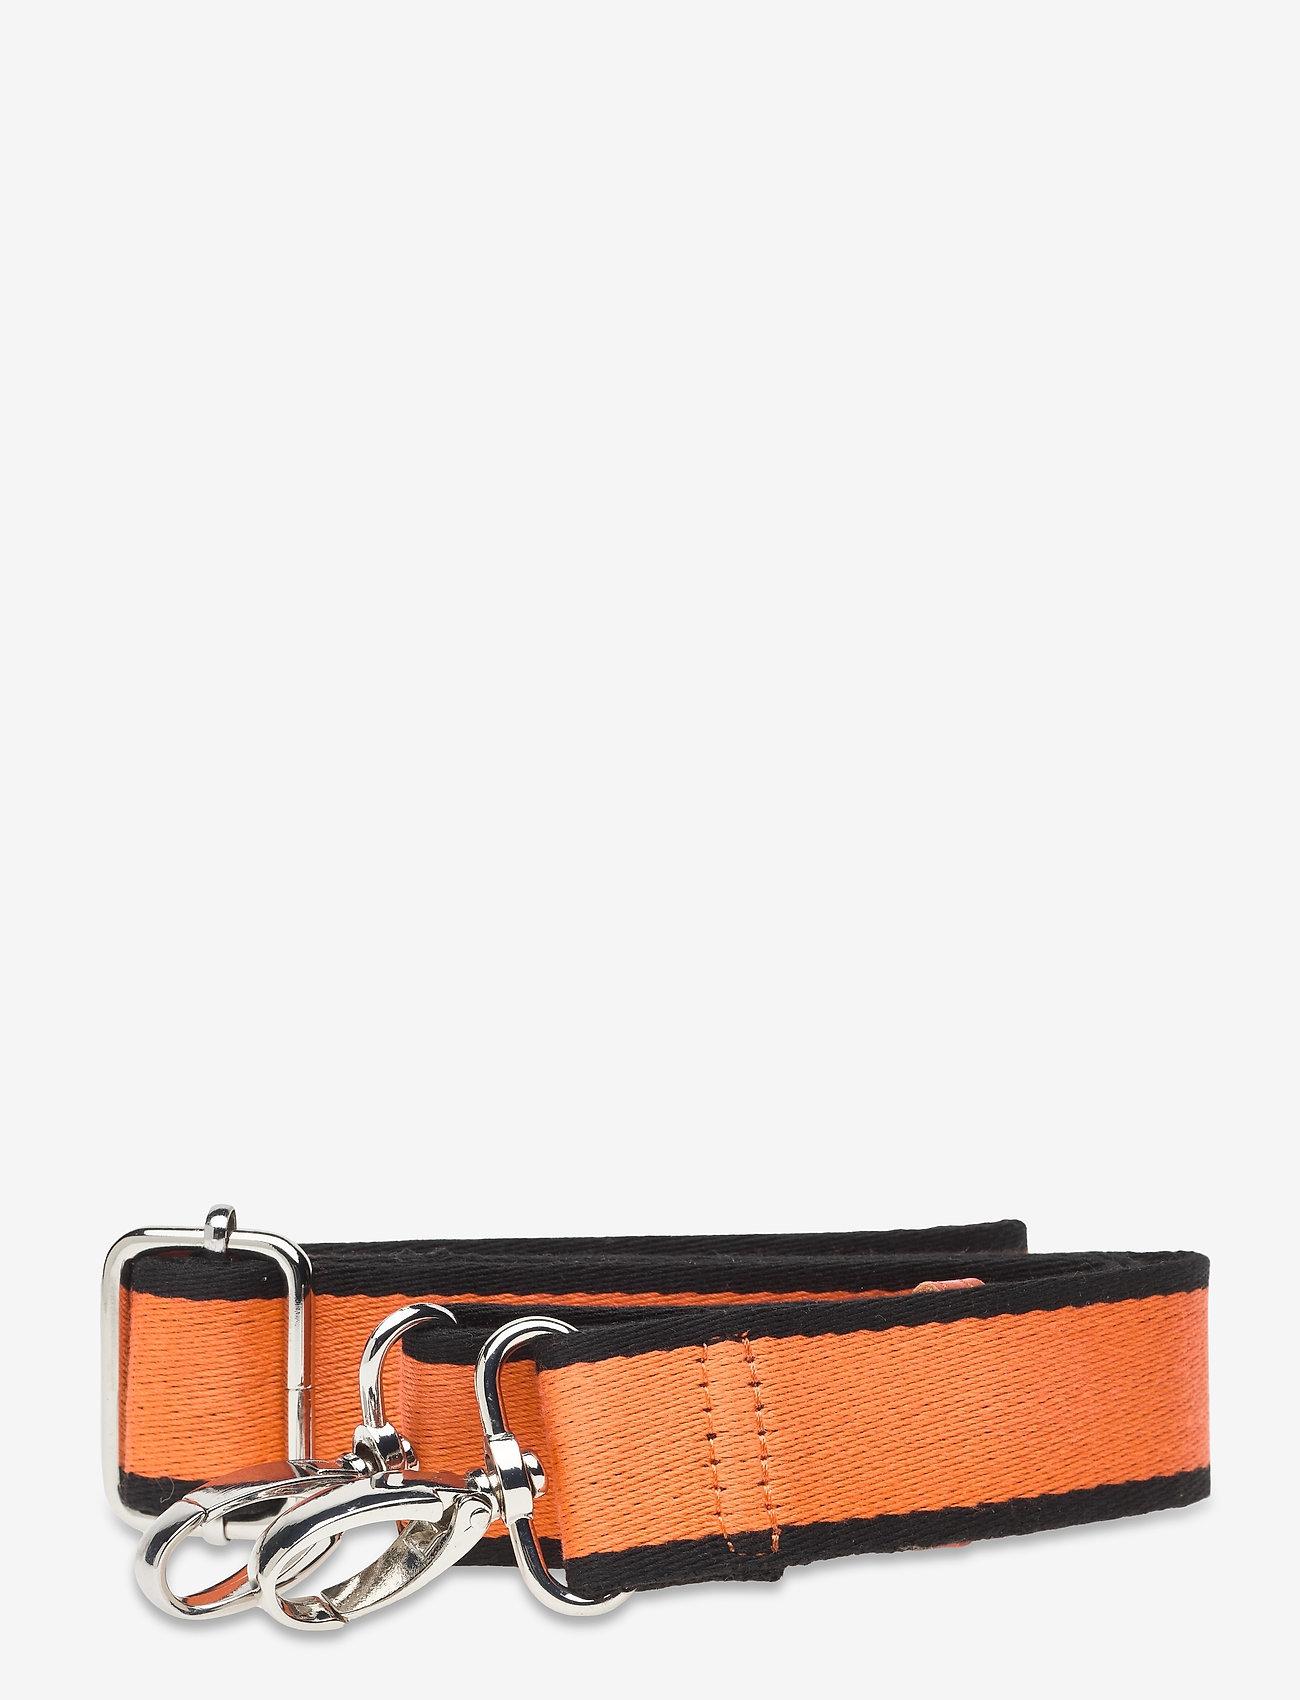 Unlimit - Unlimit strap Tiffany - sale - orange - 0